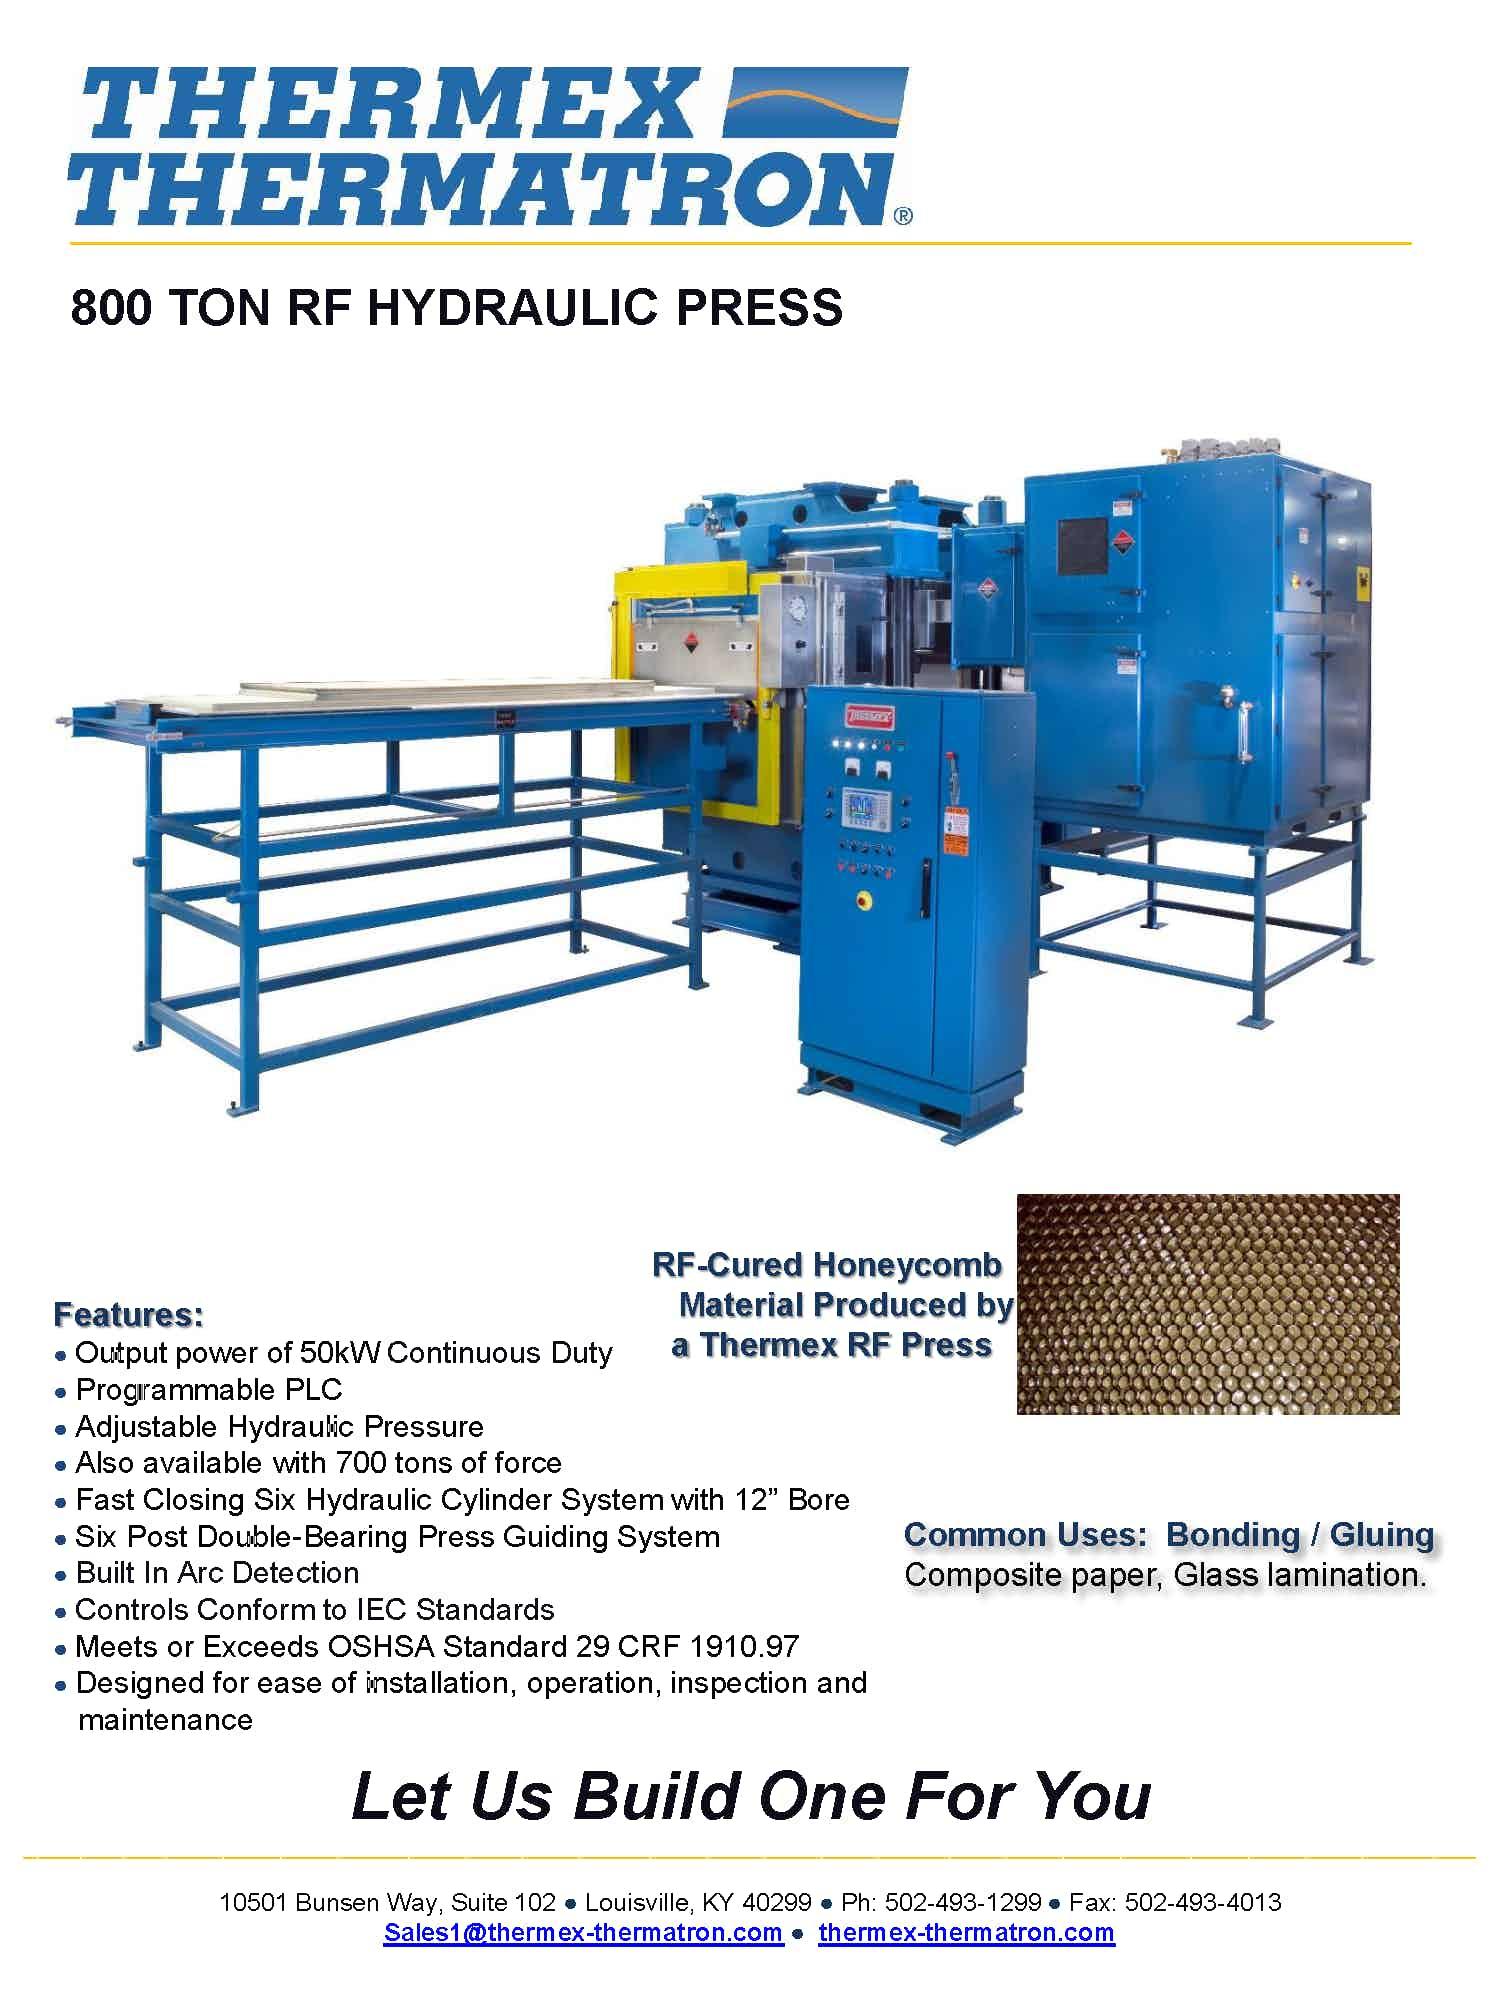 800 Ton Rf Hydraulic Press Png Page 1